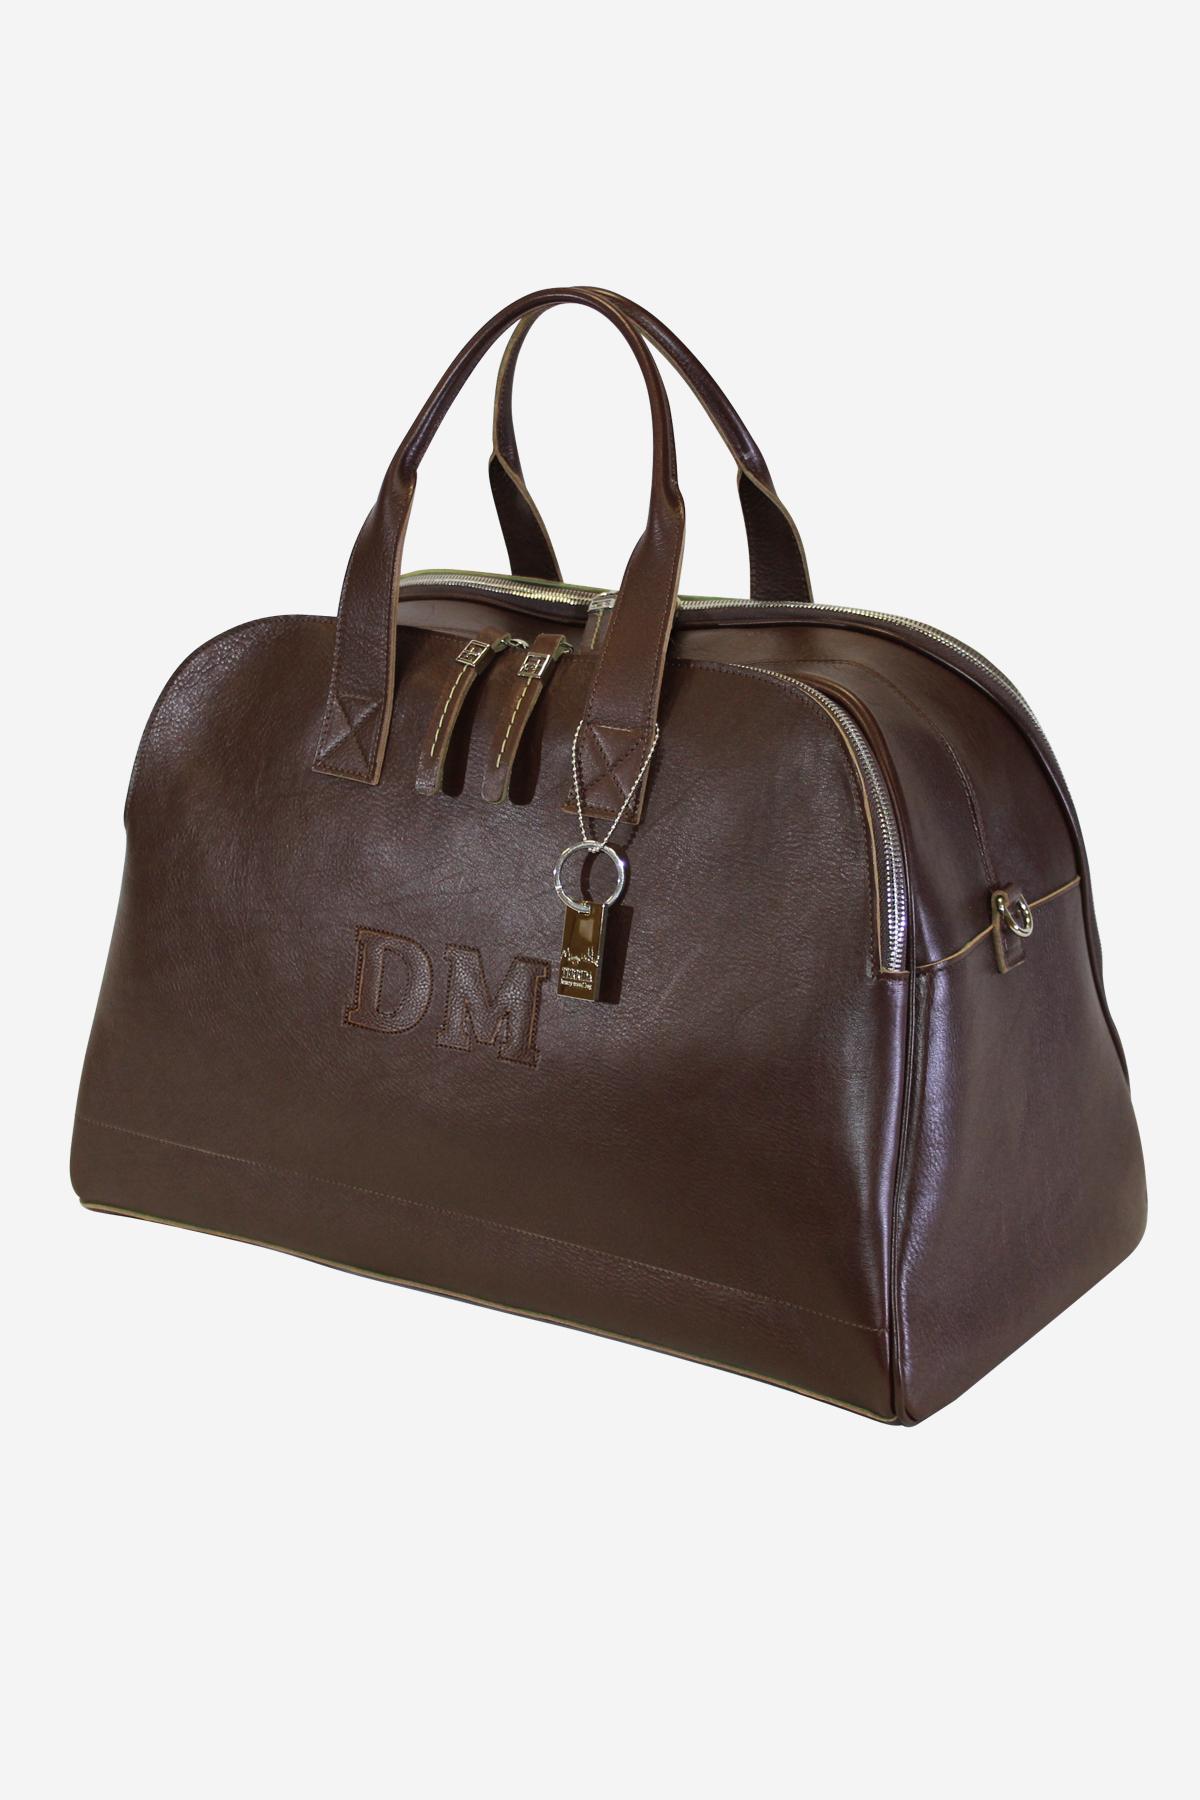 Aviator Bag handmade in italy vegetable tanned leather terrida venezia italy microfiber italian bag duffle bag